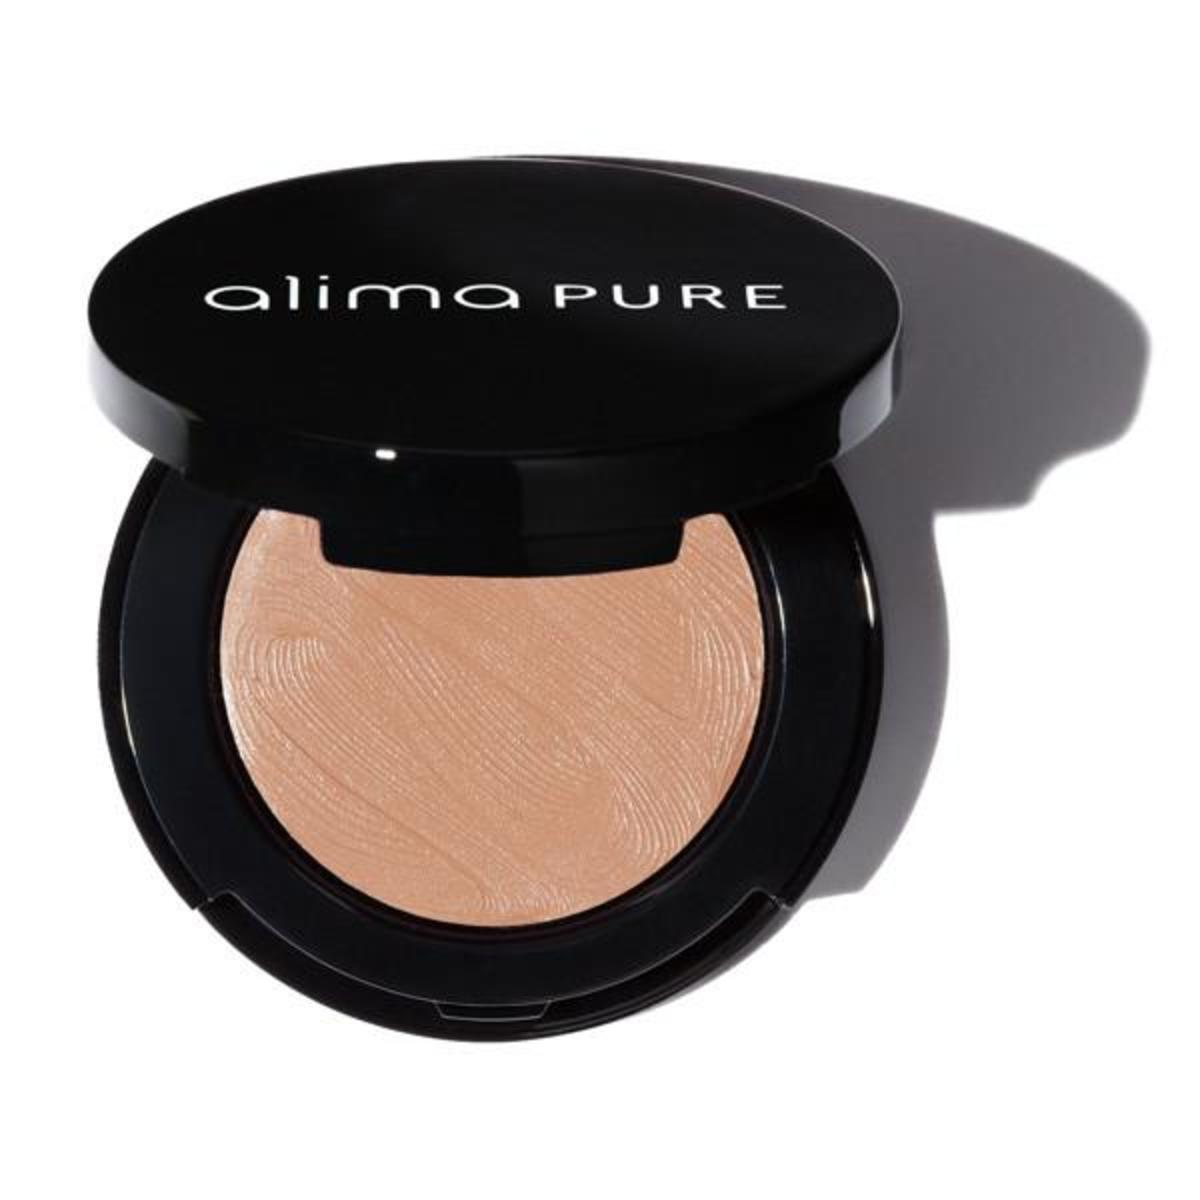 Muse-Cream-Concealer-Alima-Pure-WEBSITE